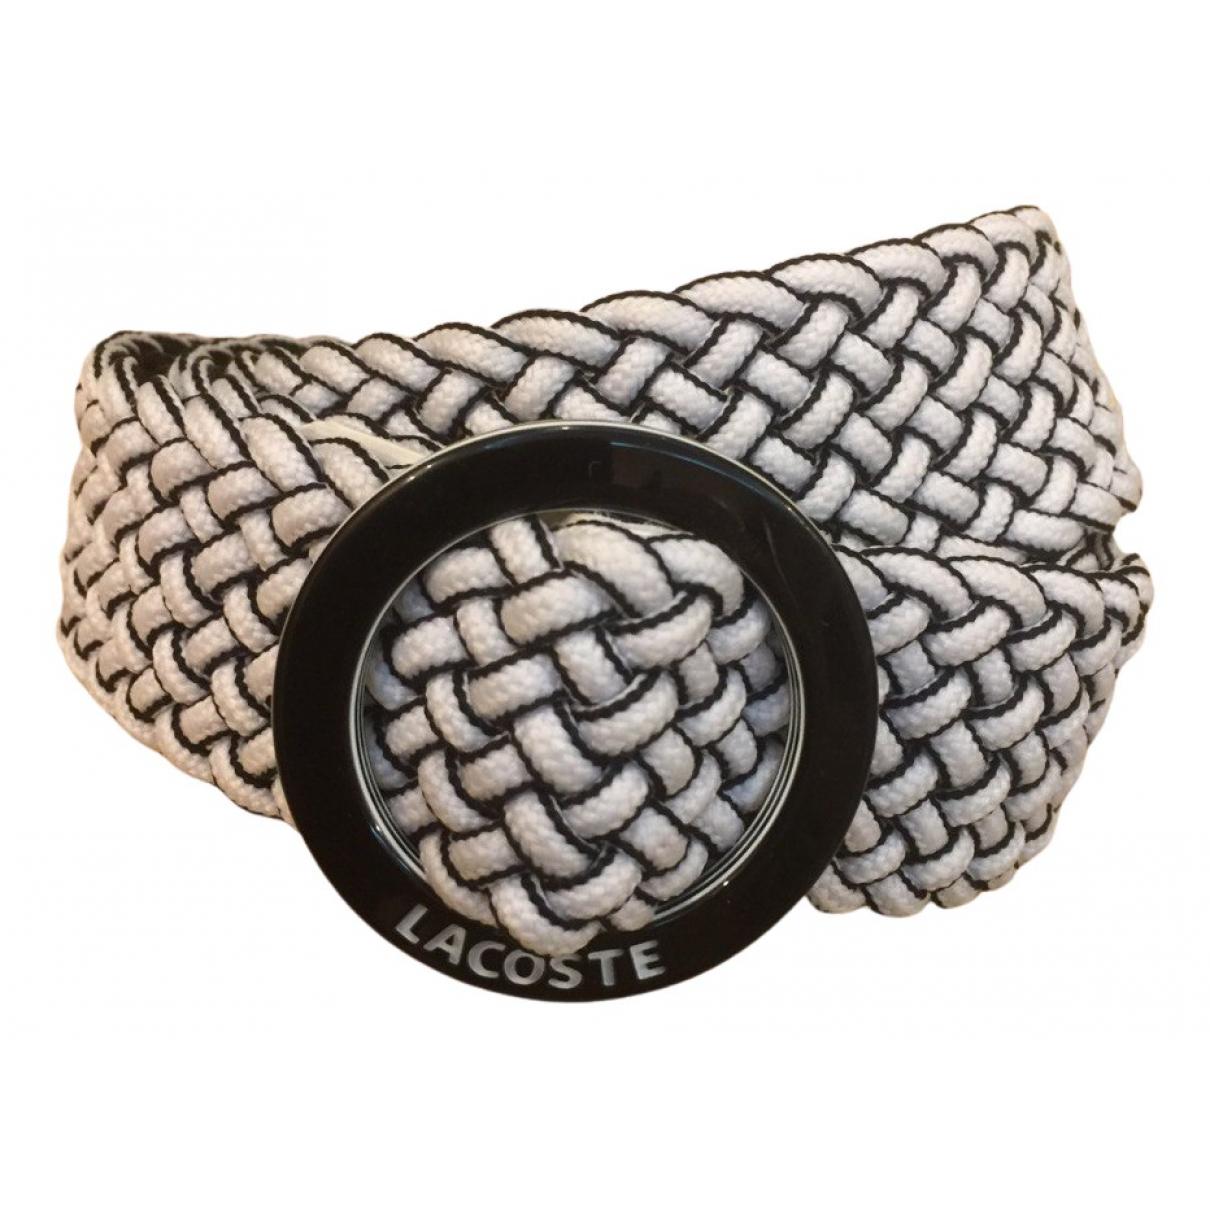 Lacoste N White Cloth belt for Women 85 cm